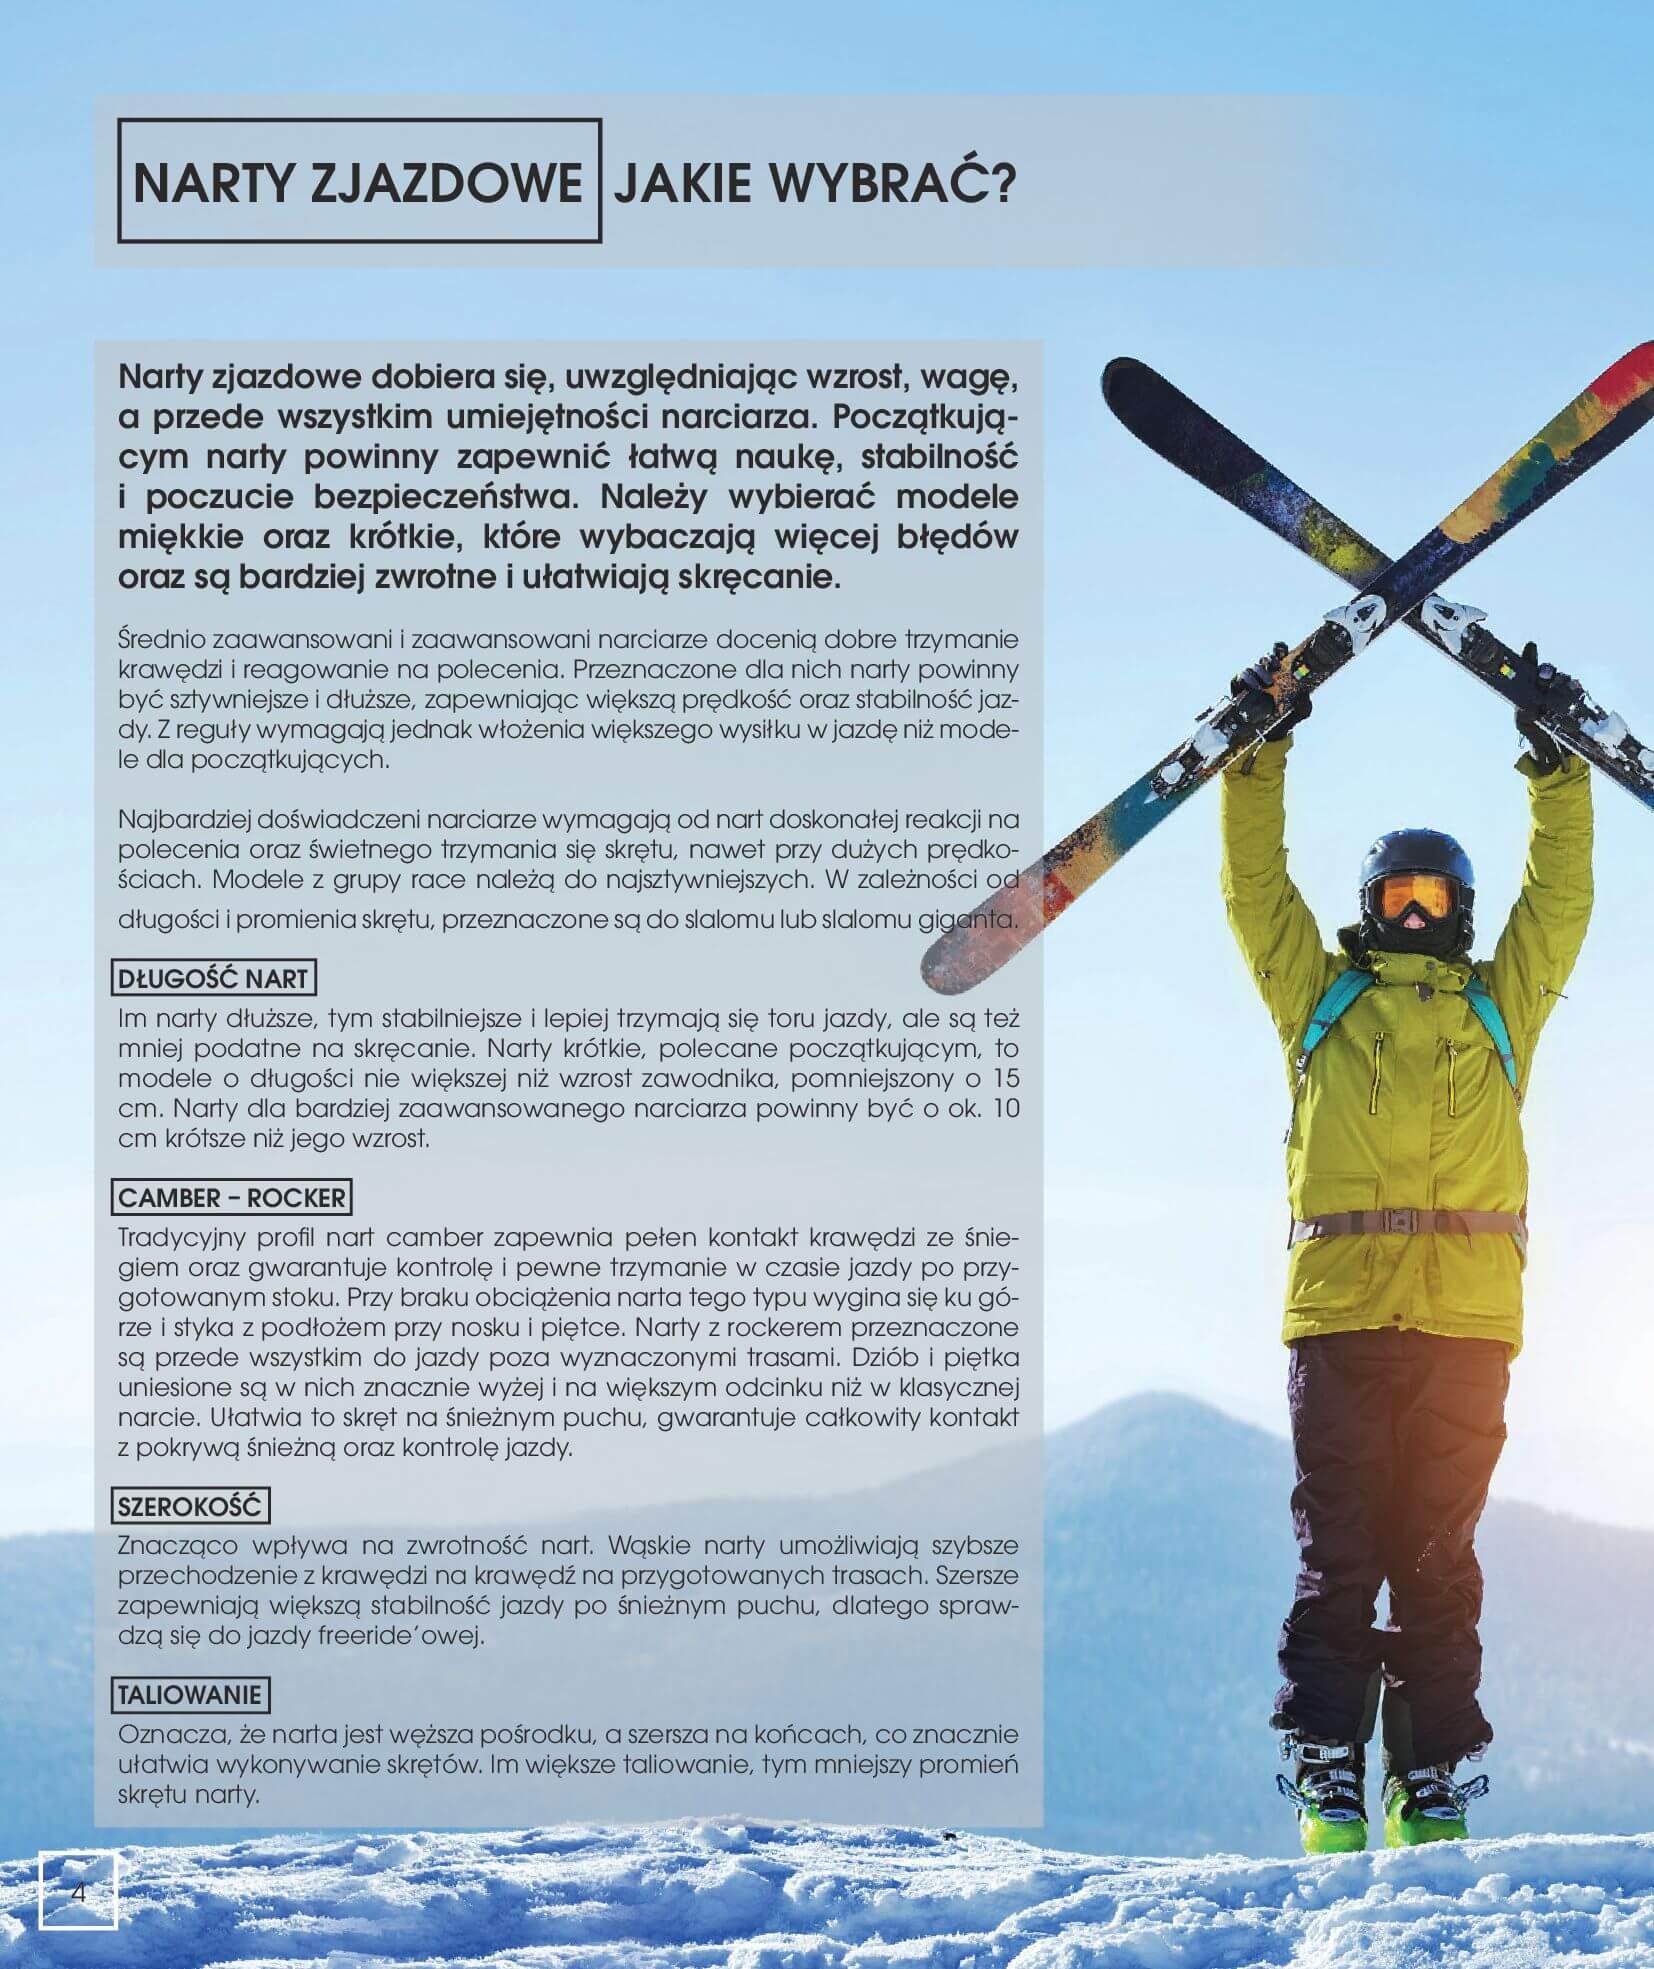 Gazetka Go Sport - Katalog Zima 2017/2018-12.11.2017-28.02.2018-page-4